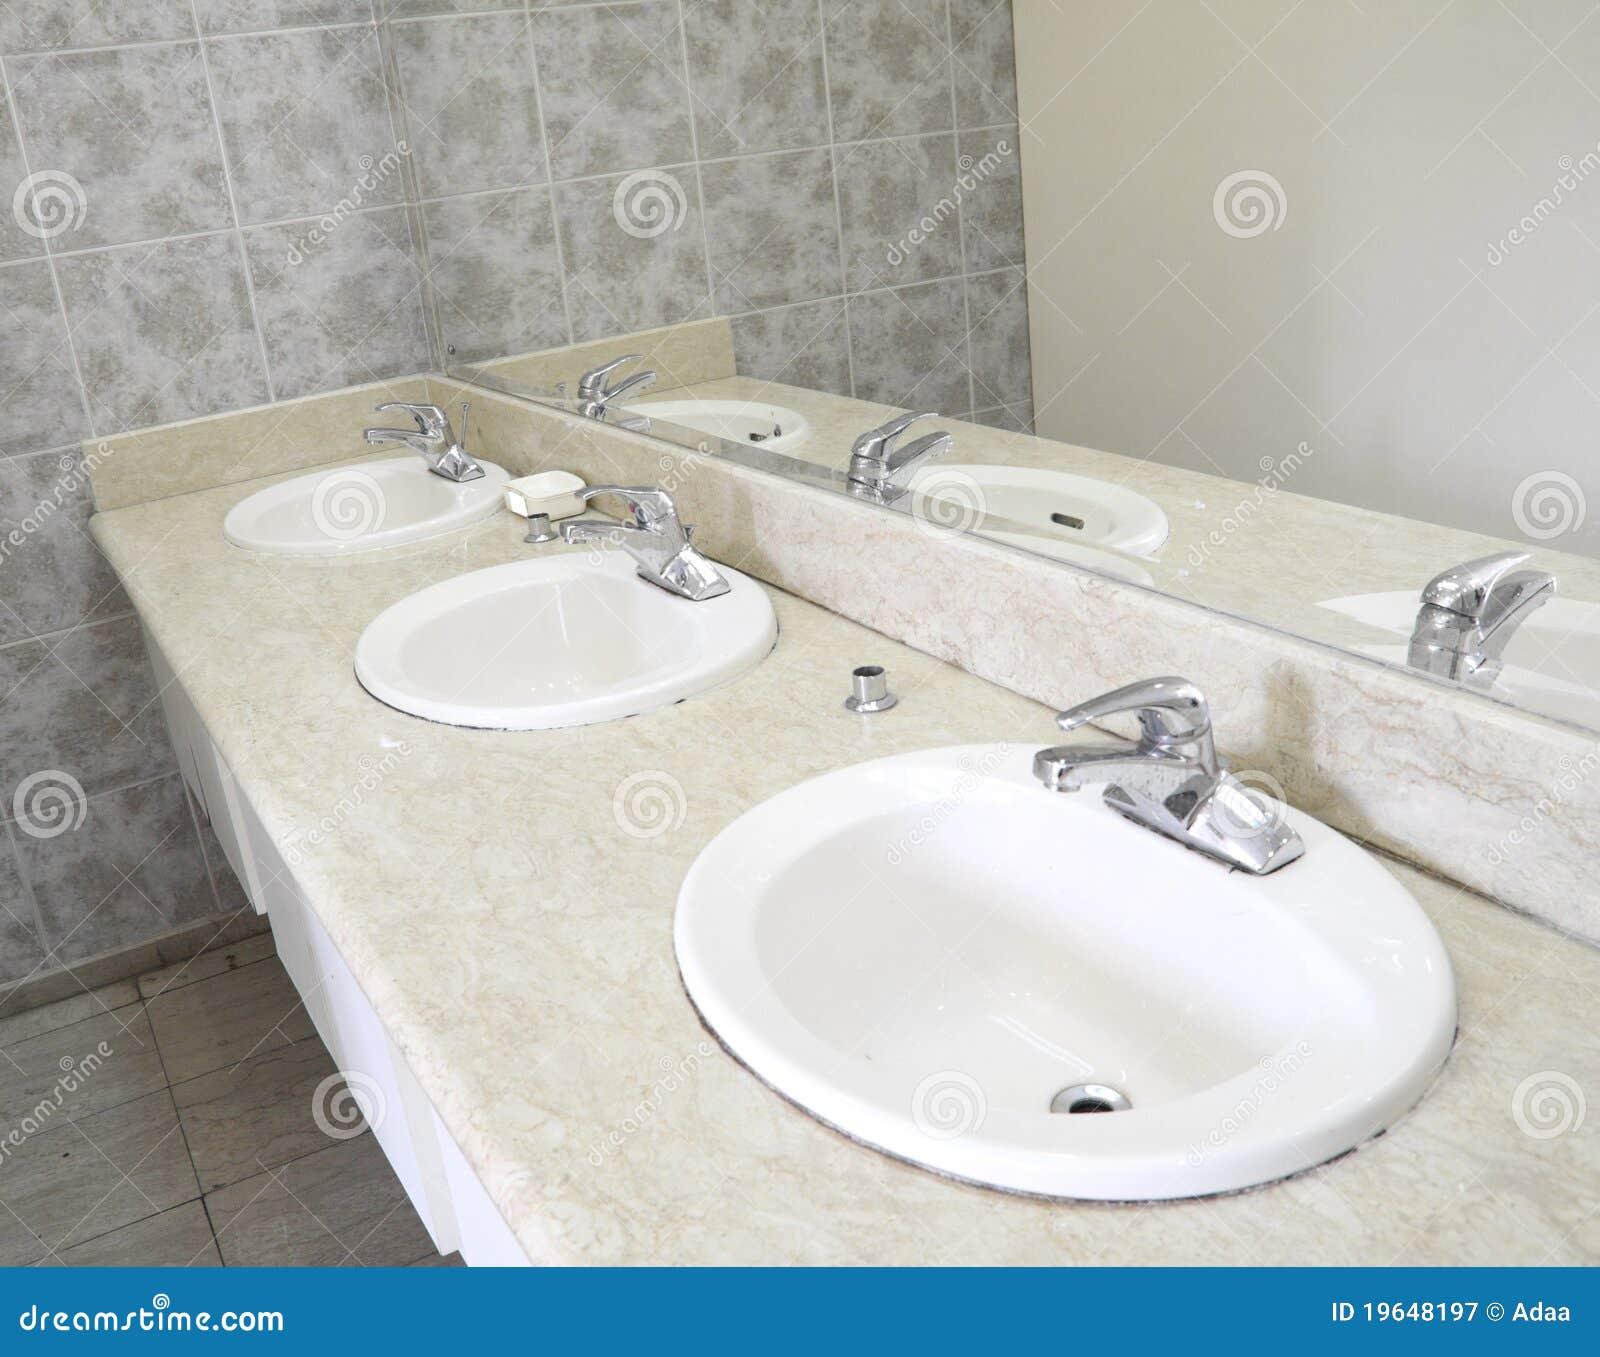 Ceramic sanitary ware bathroom royalty free stock for Bathroom ware